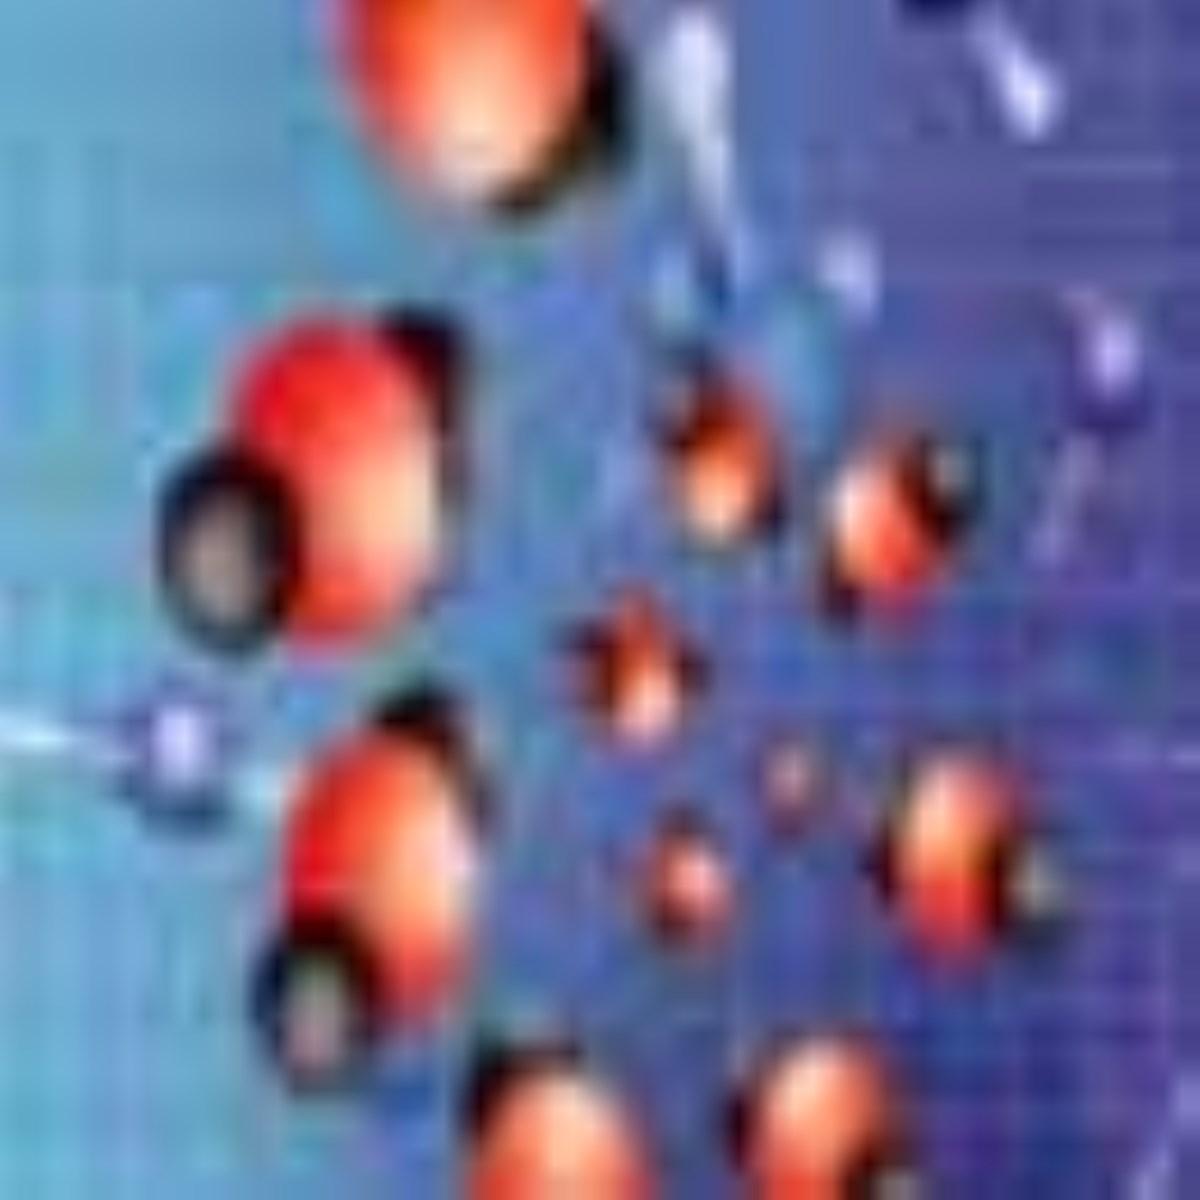 تعريفي كوتاه از نانو تكنولوزي